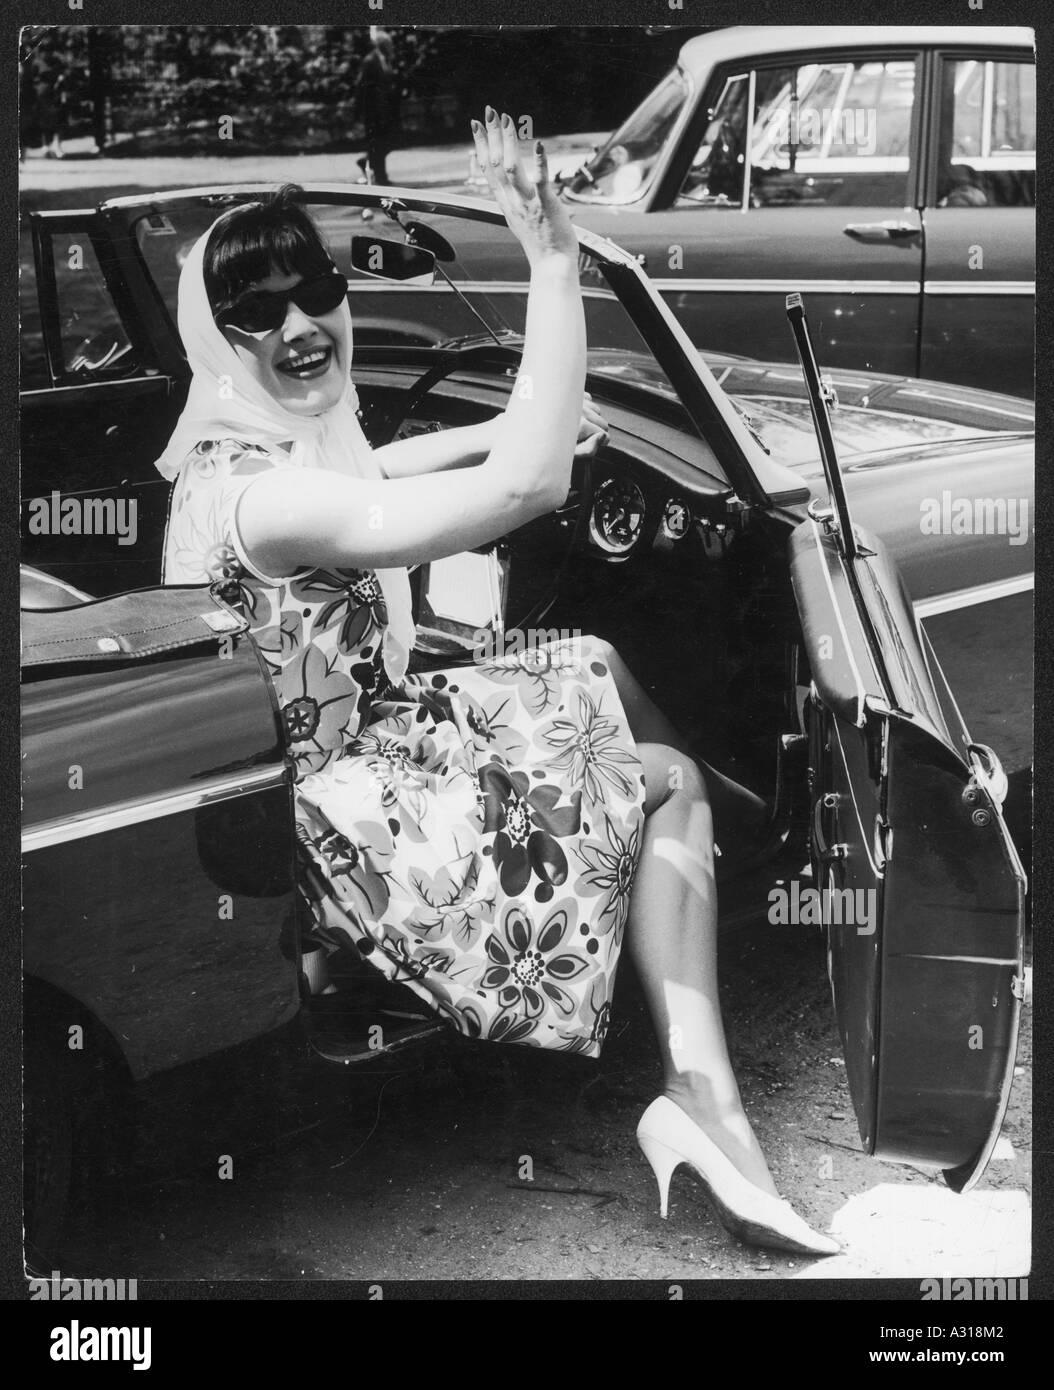 60s Fashion Convertible Imagen De Stock